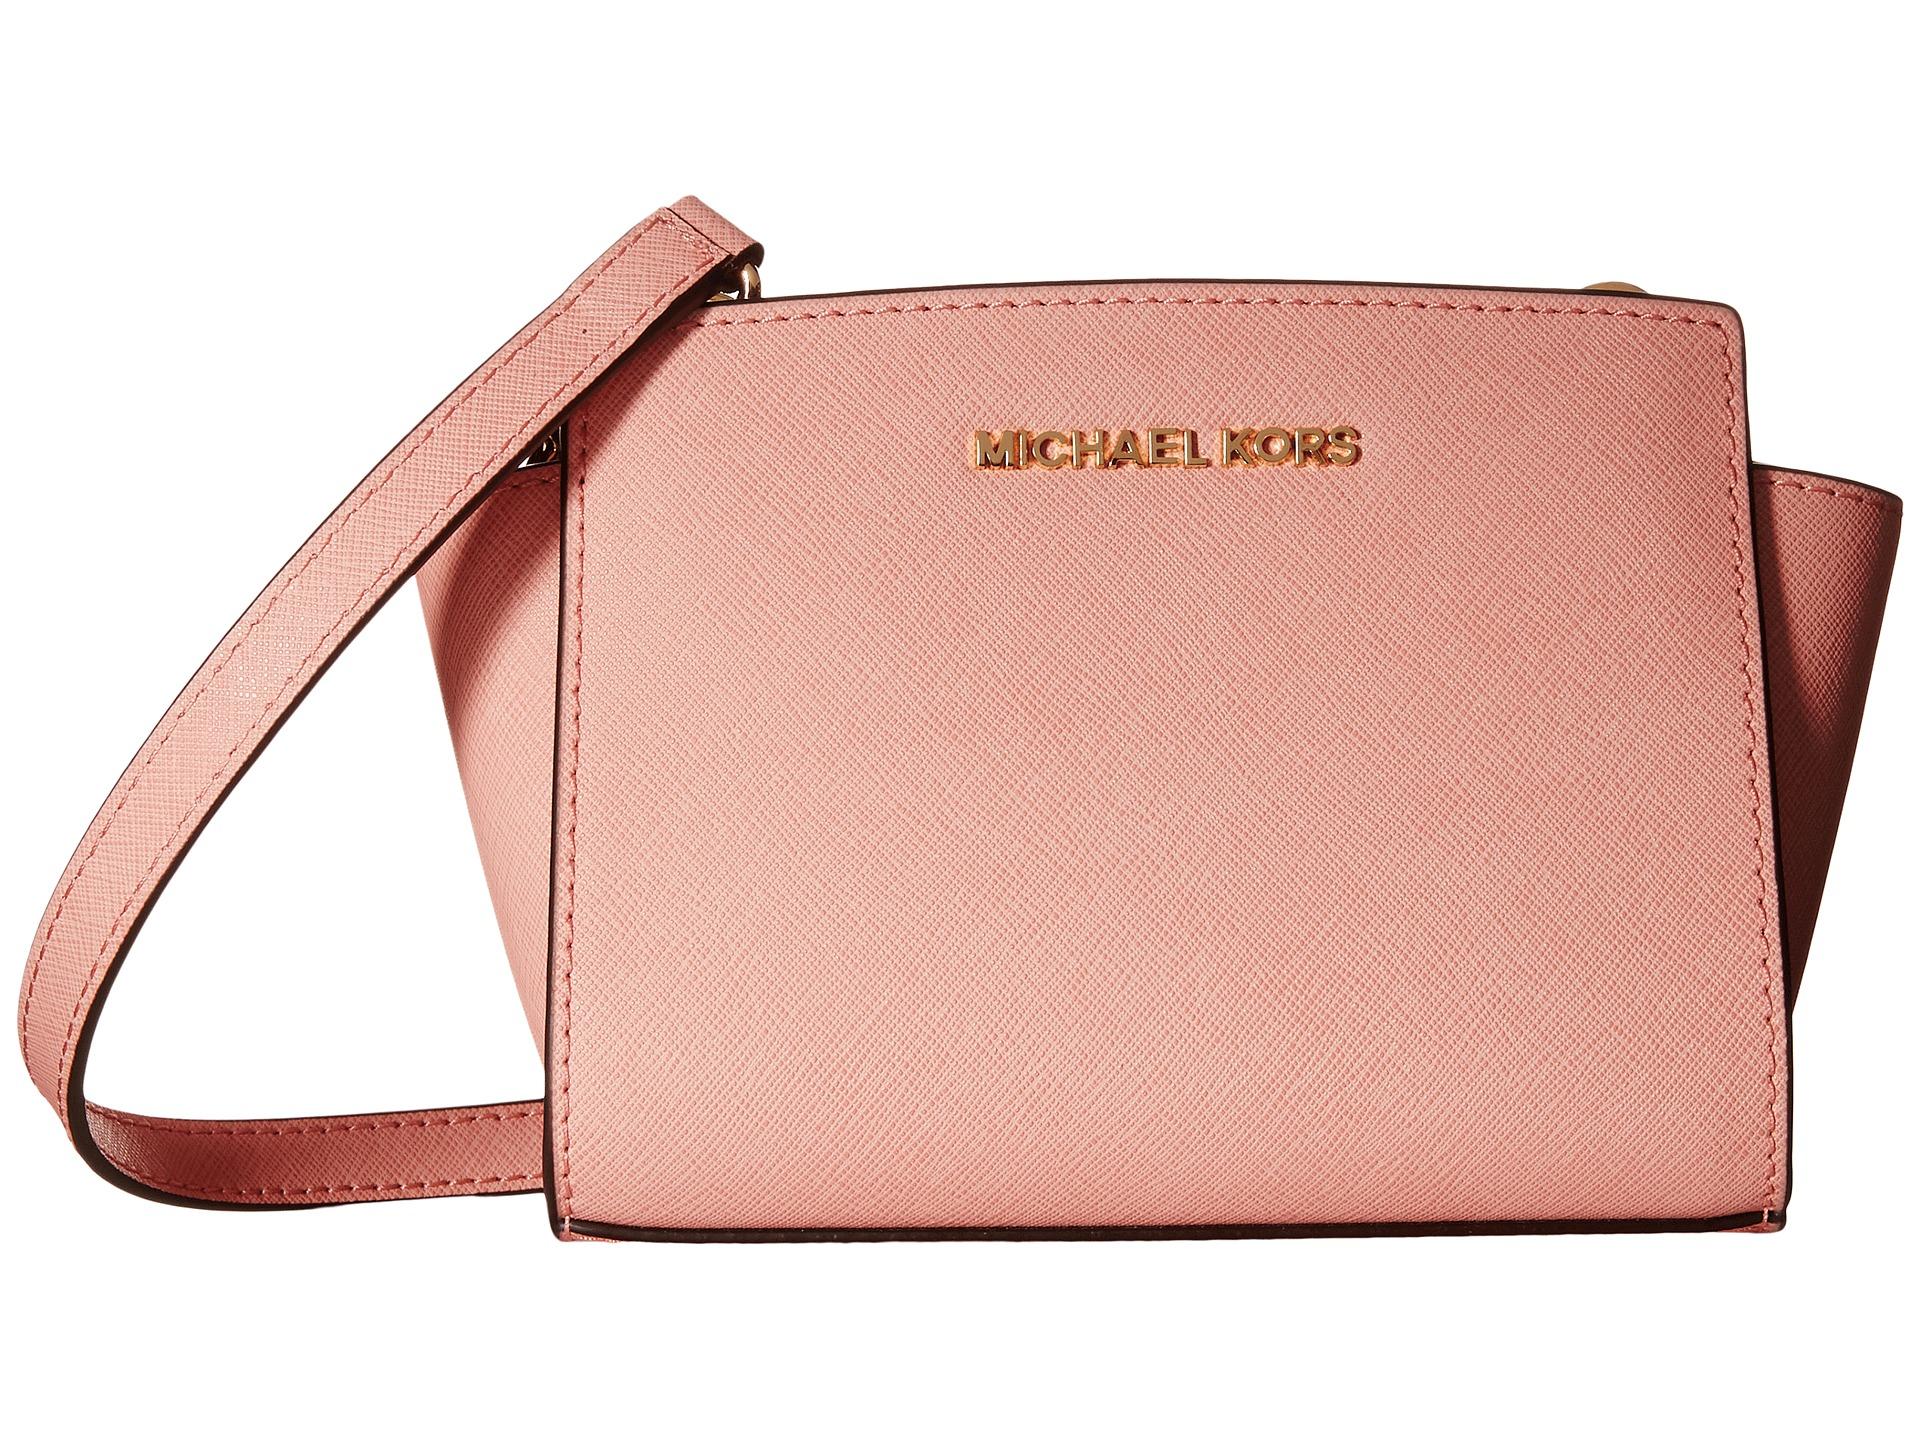 e1a6f5363650 sale michael kors medium selma 1841f 32a2a  sweden lyst michael michael  kors selma mini messenger in pink cacb8 01737